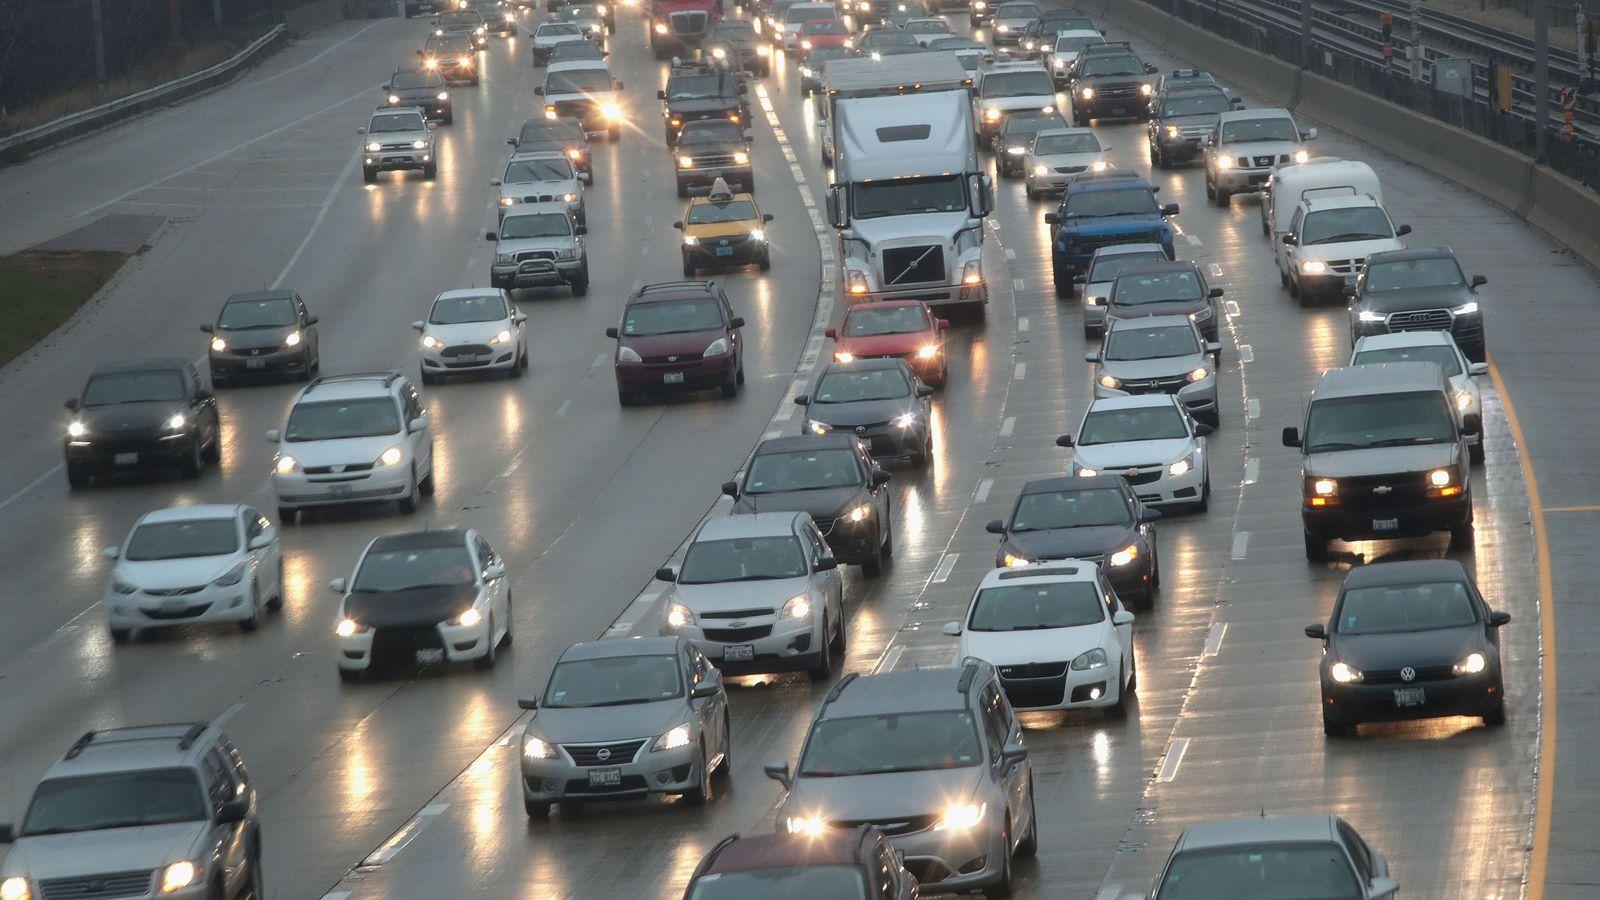 cars, department of transportation, drug testing, employee screening, Blueline Services